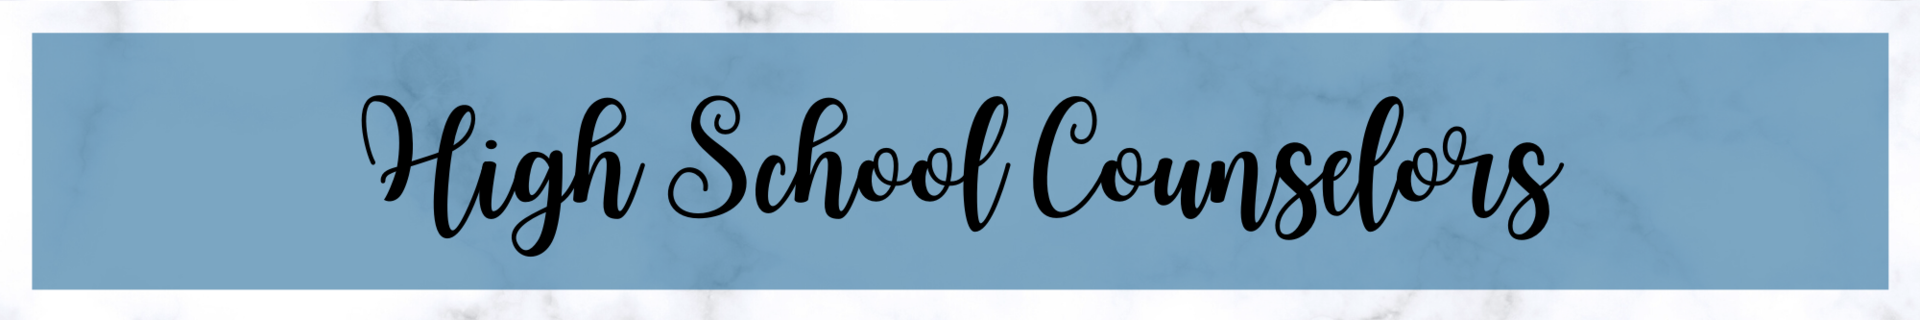 High School Counselor Directory Header